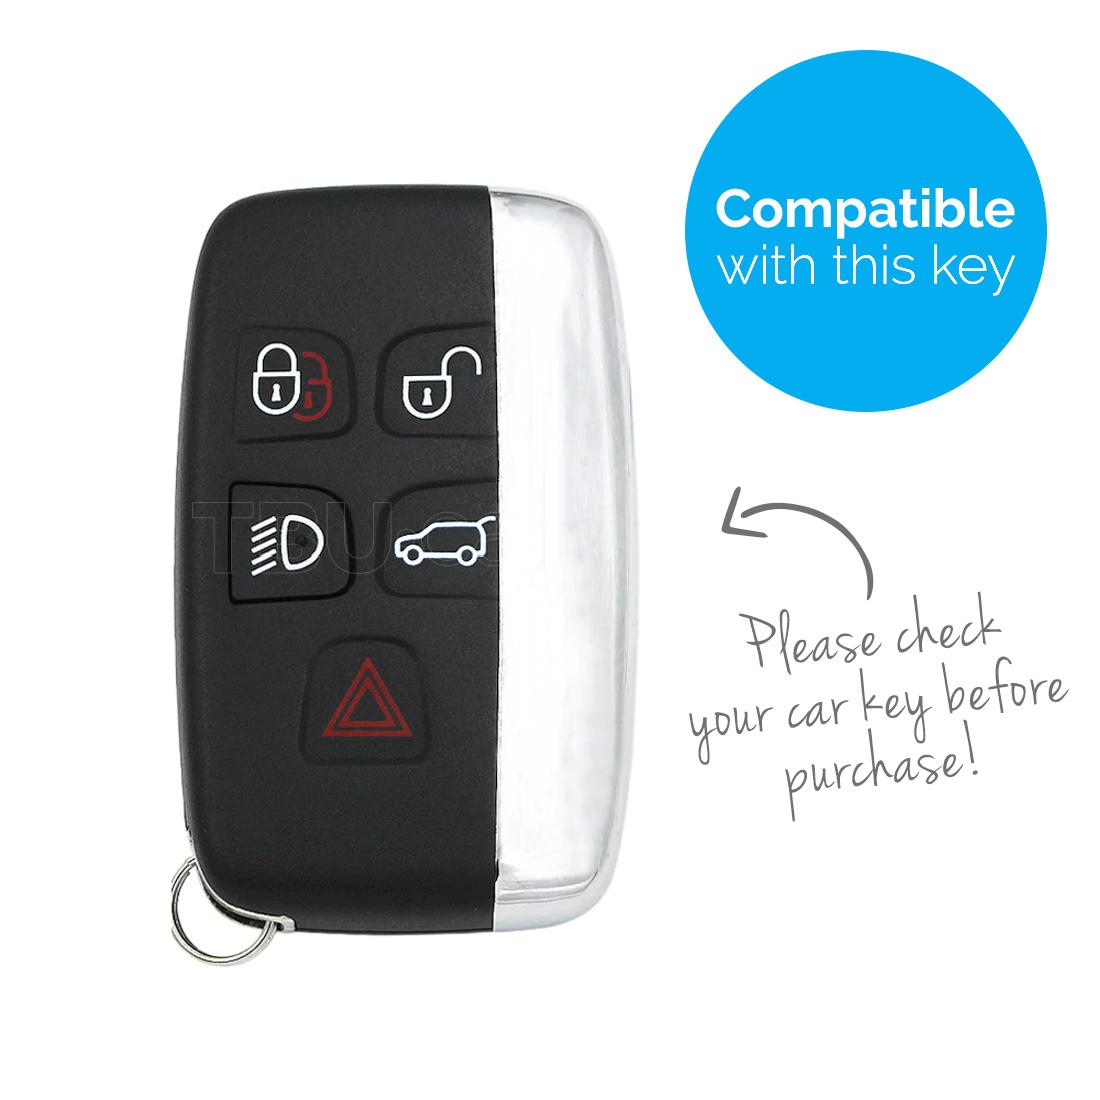 TBU car TBU car Sleutel cover compatibel met Range Rover - Silicone sleutelhoesje - beschermhoesje autosleutel - Lichtblauw